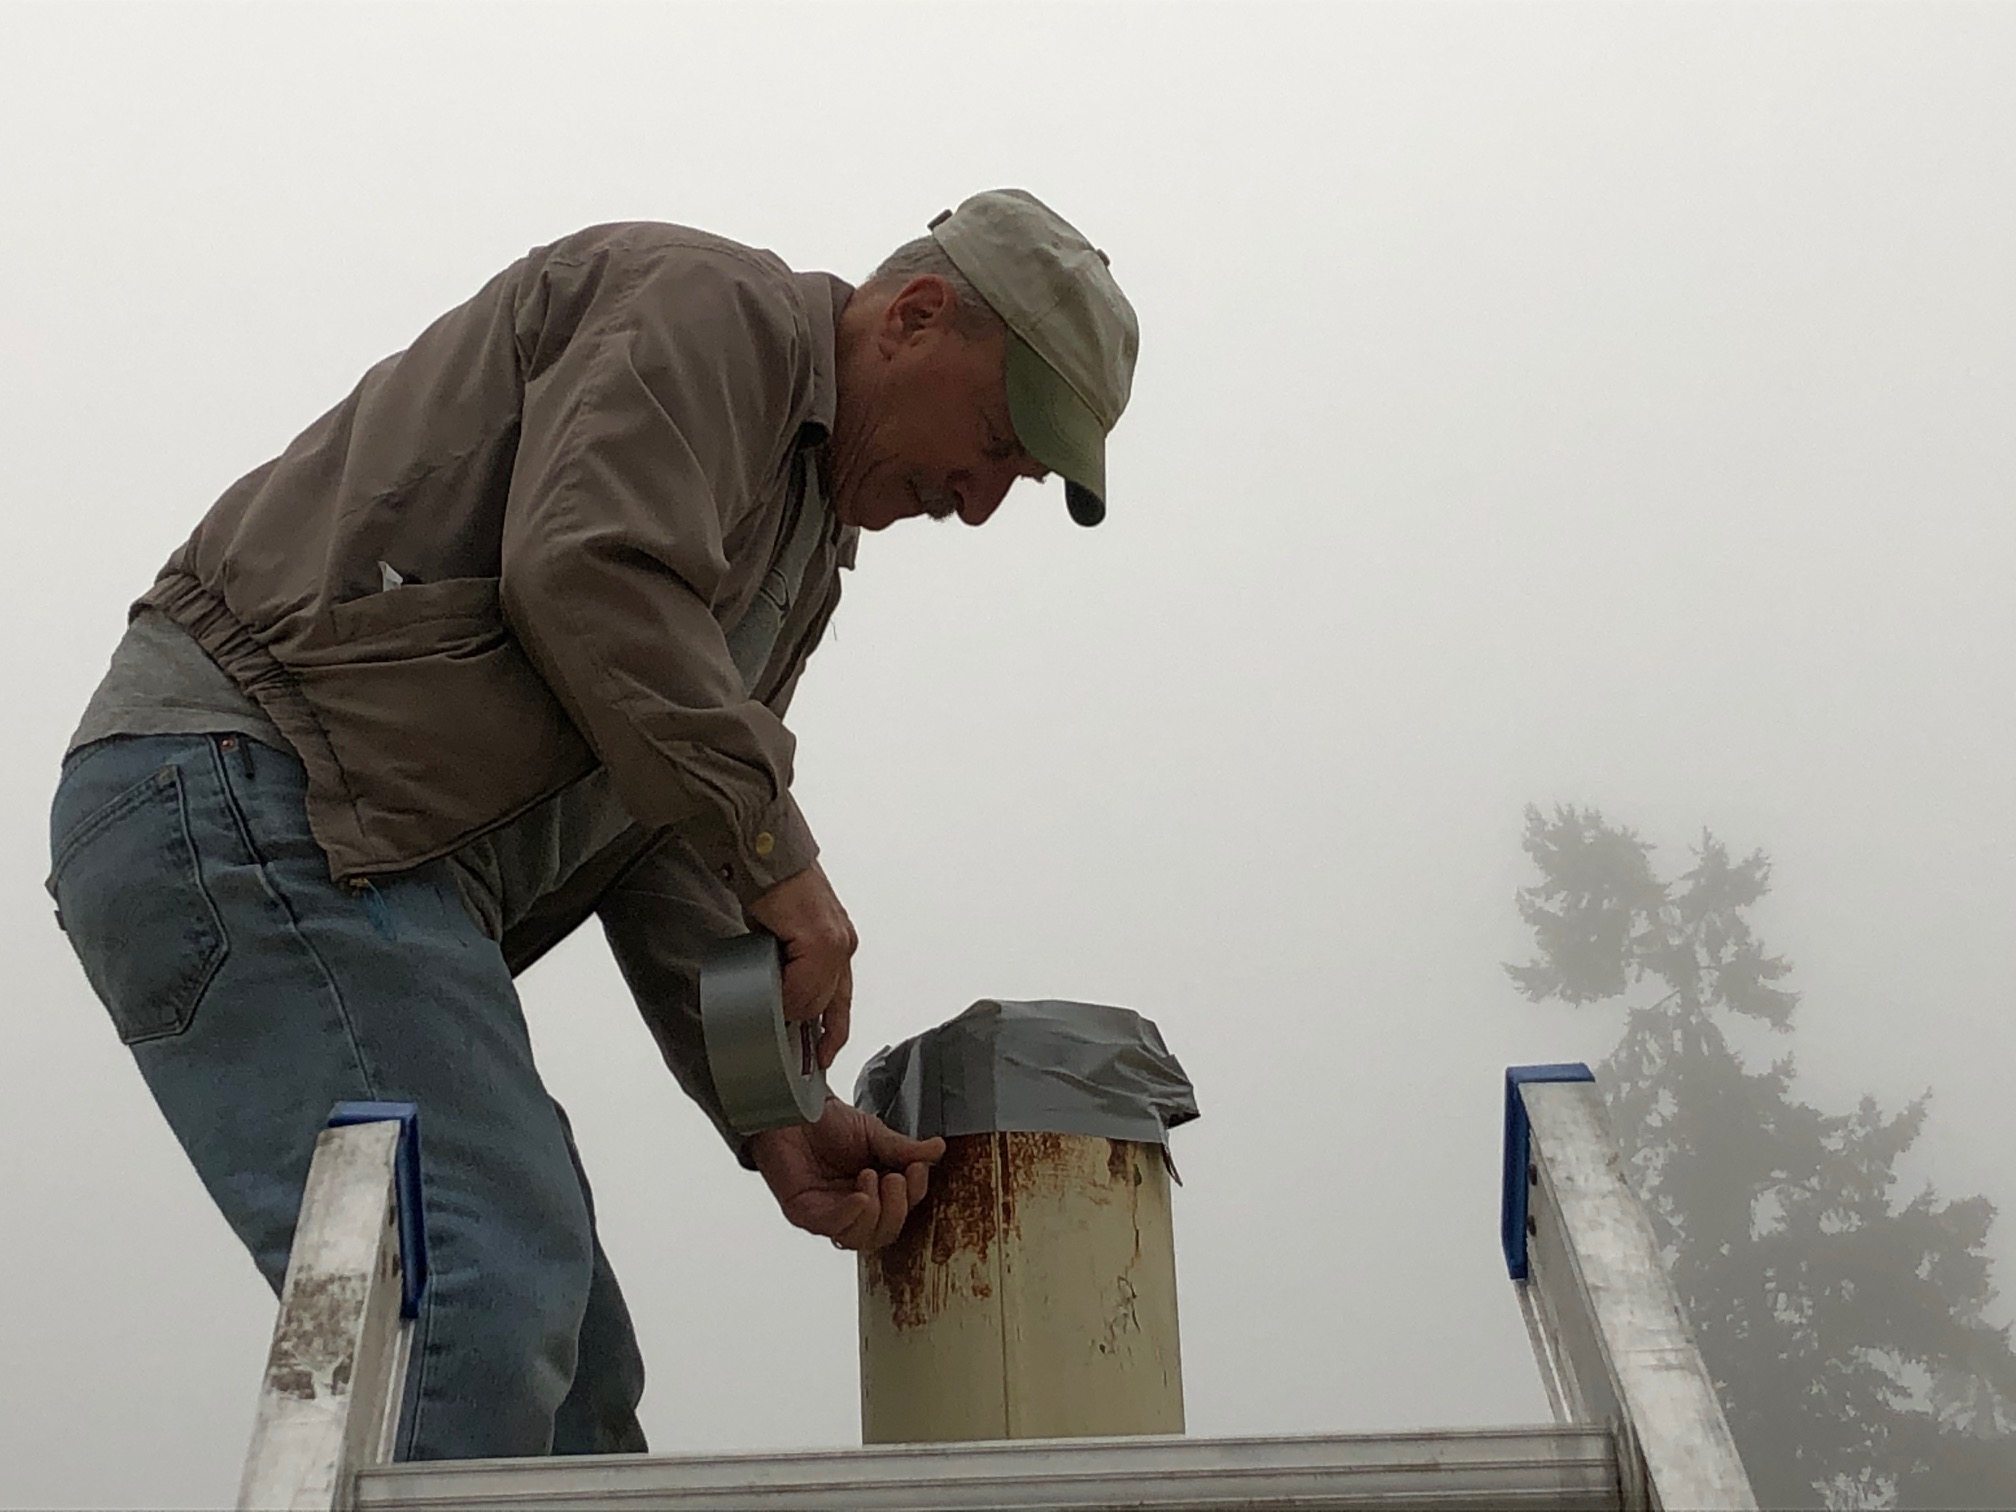 John Love doing maintenance work on the quonset hut